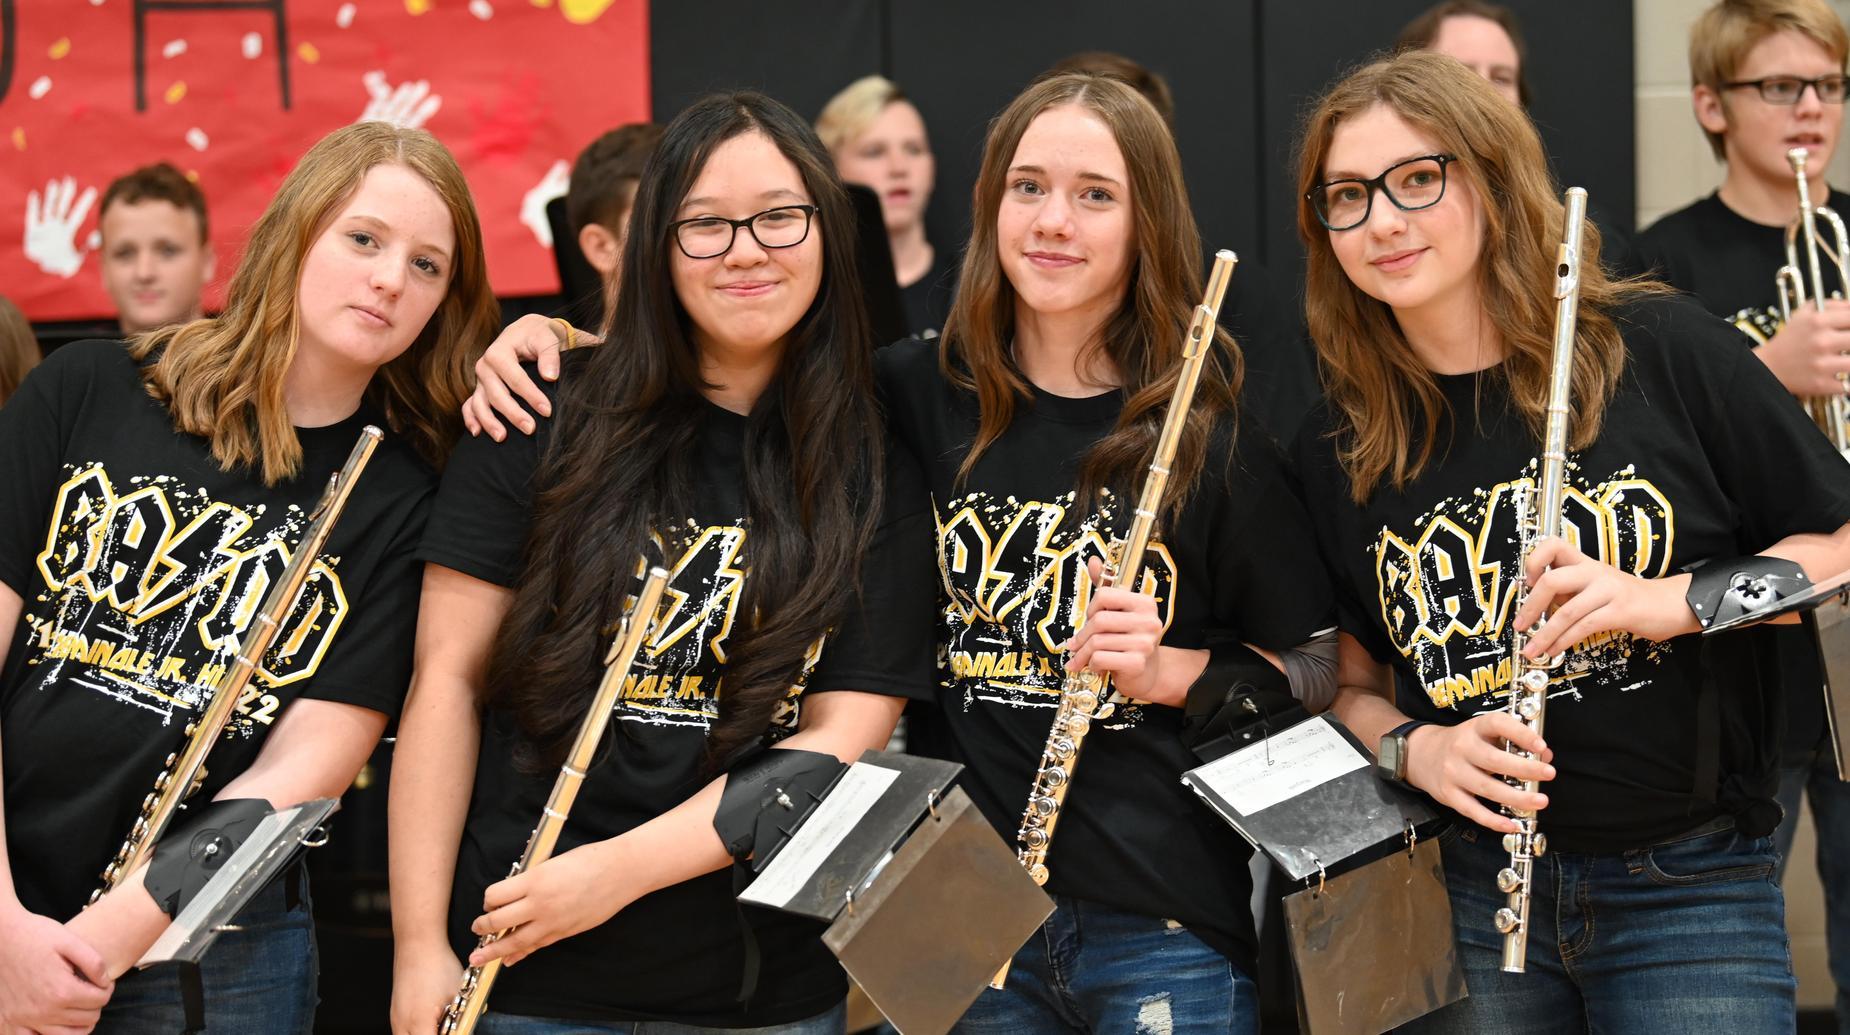 sjhs band students